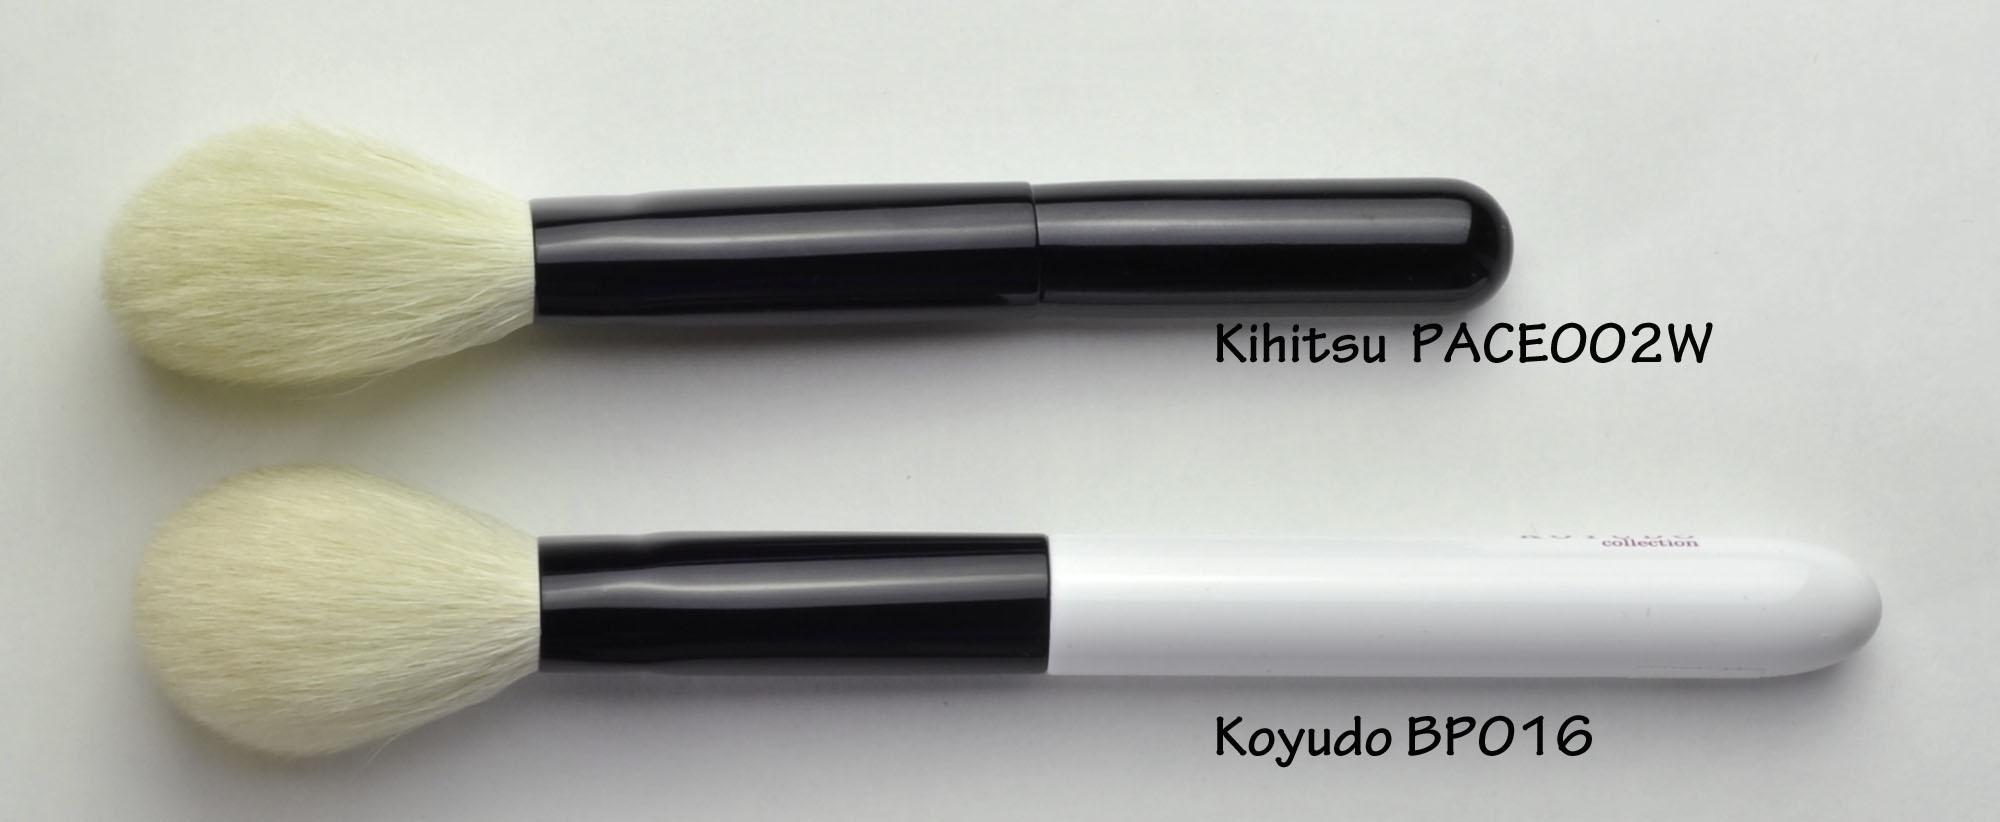 kihitsupace002sideways